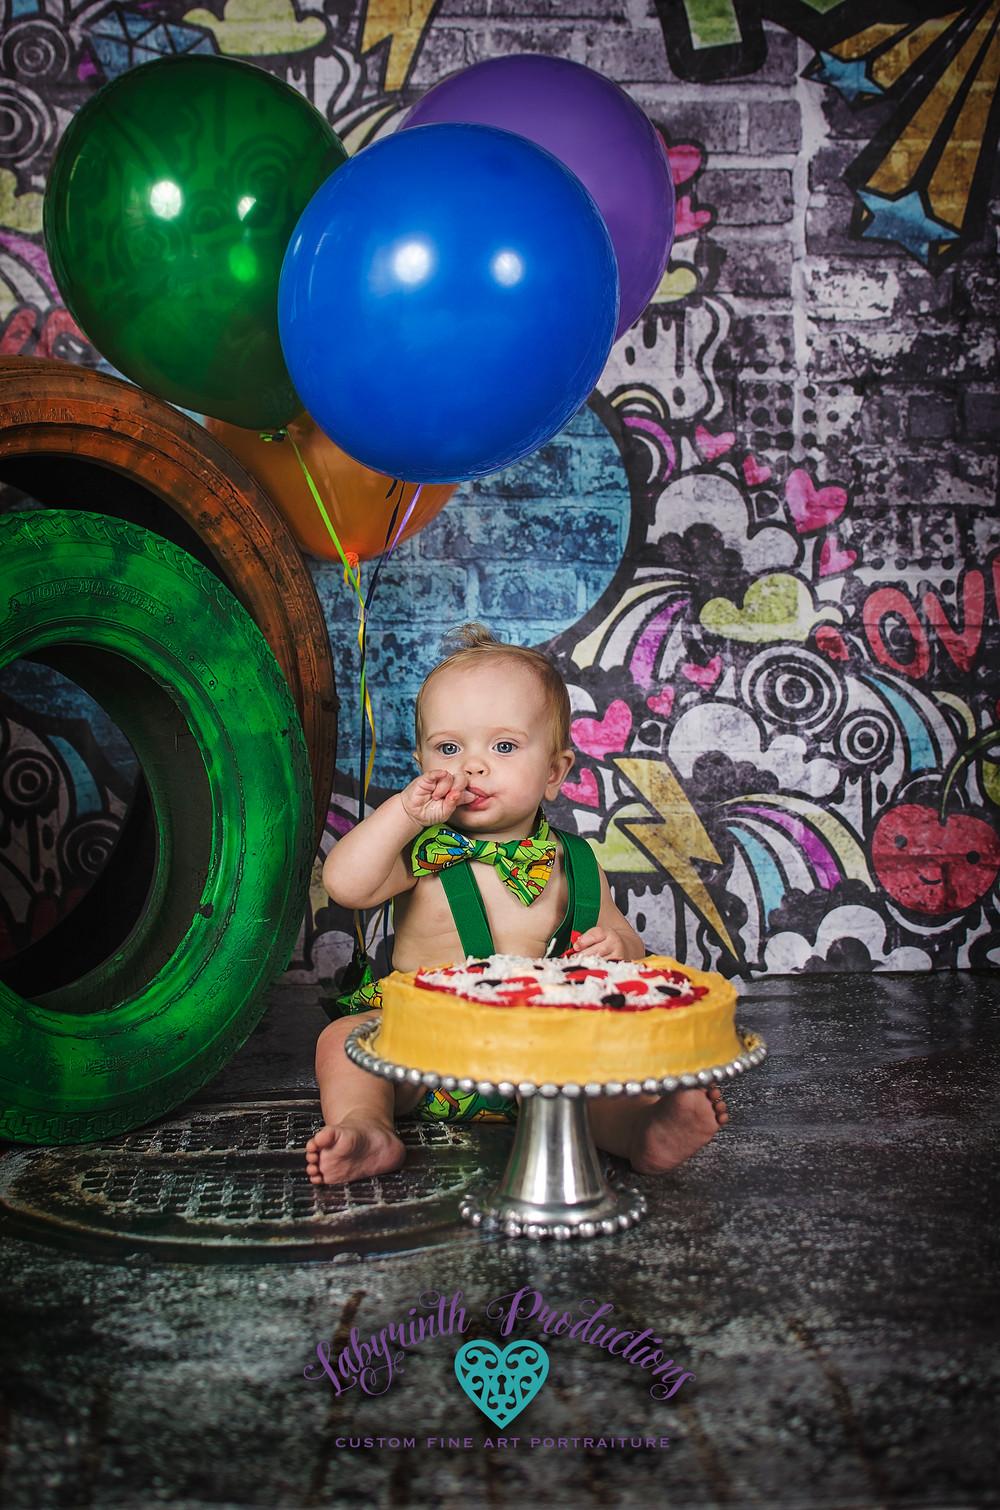 Birthday Party Ideas Virginia Beach  kai tmnt teenage mutant ninja turtle cake smash 1st with